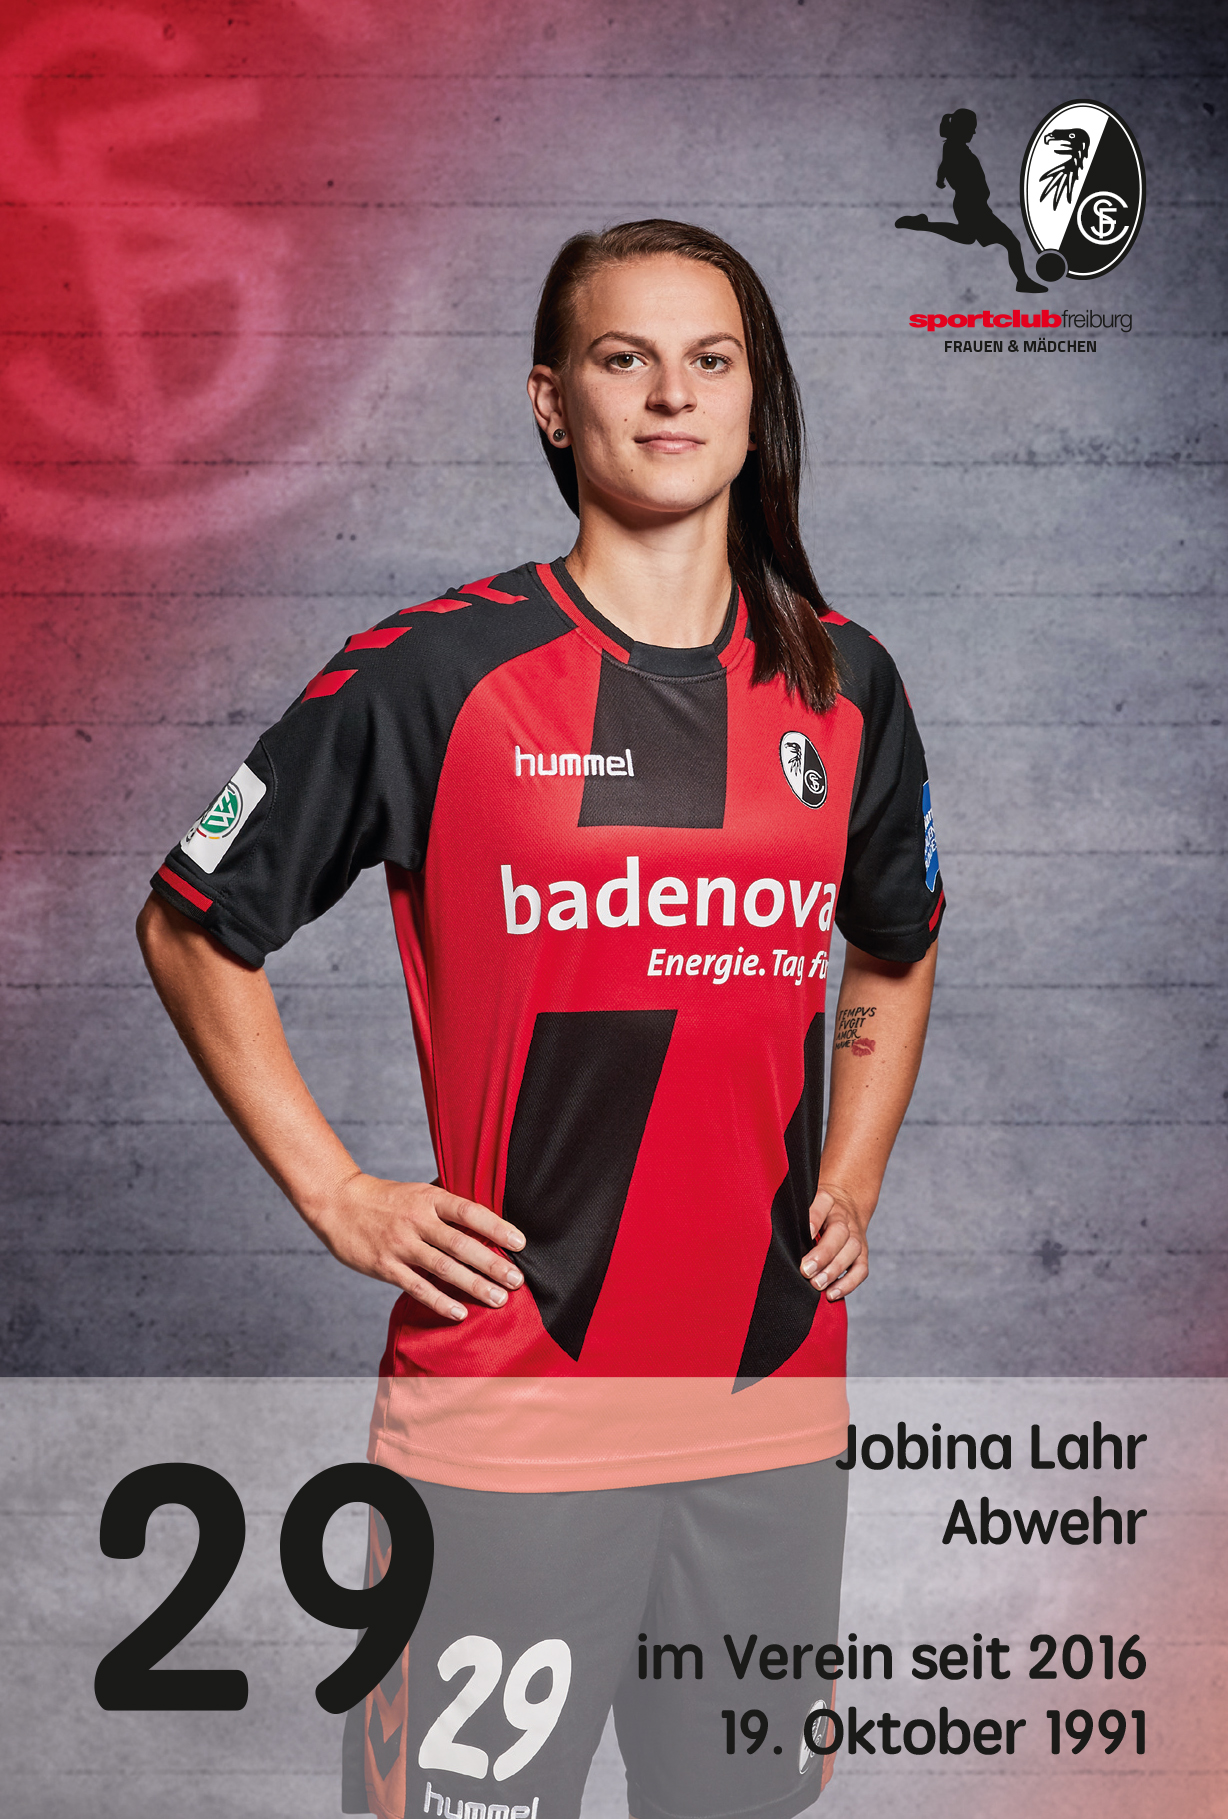 Jobina-Lahr.indd